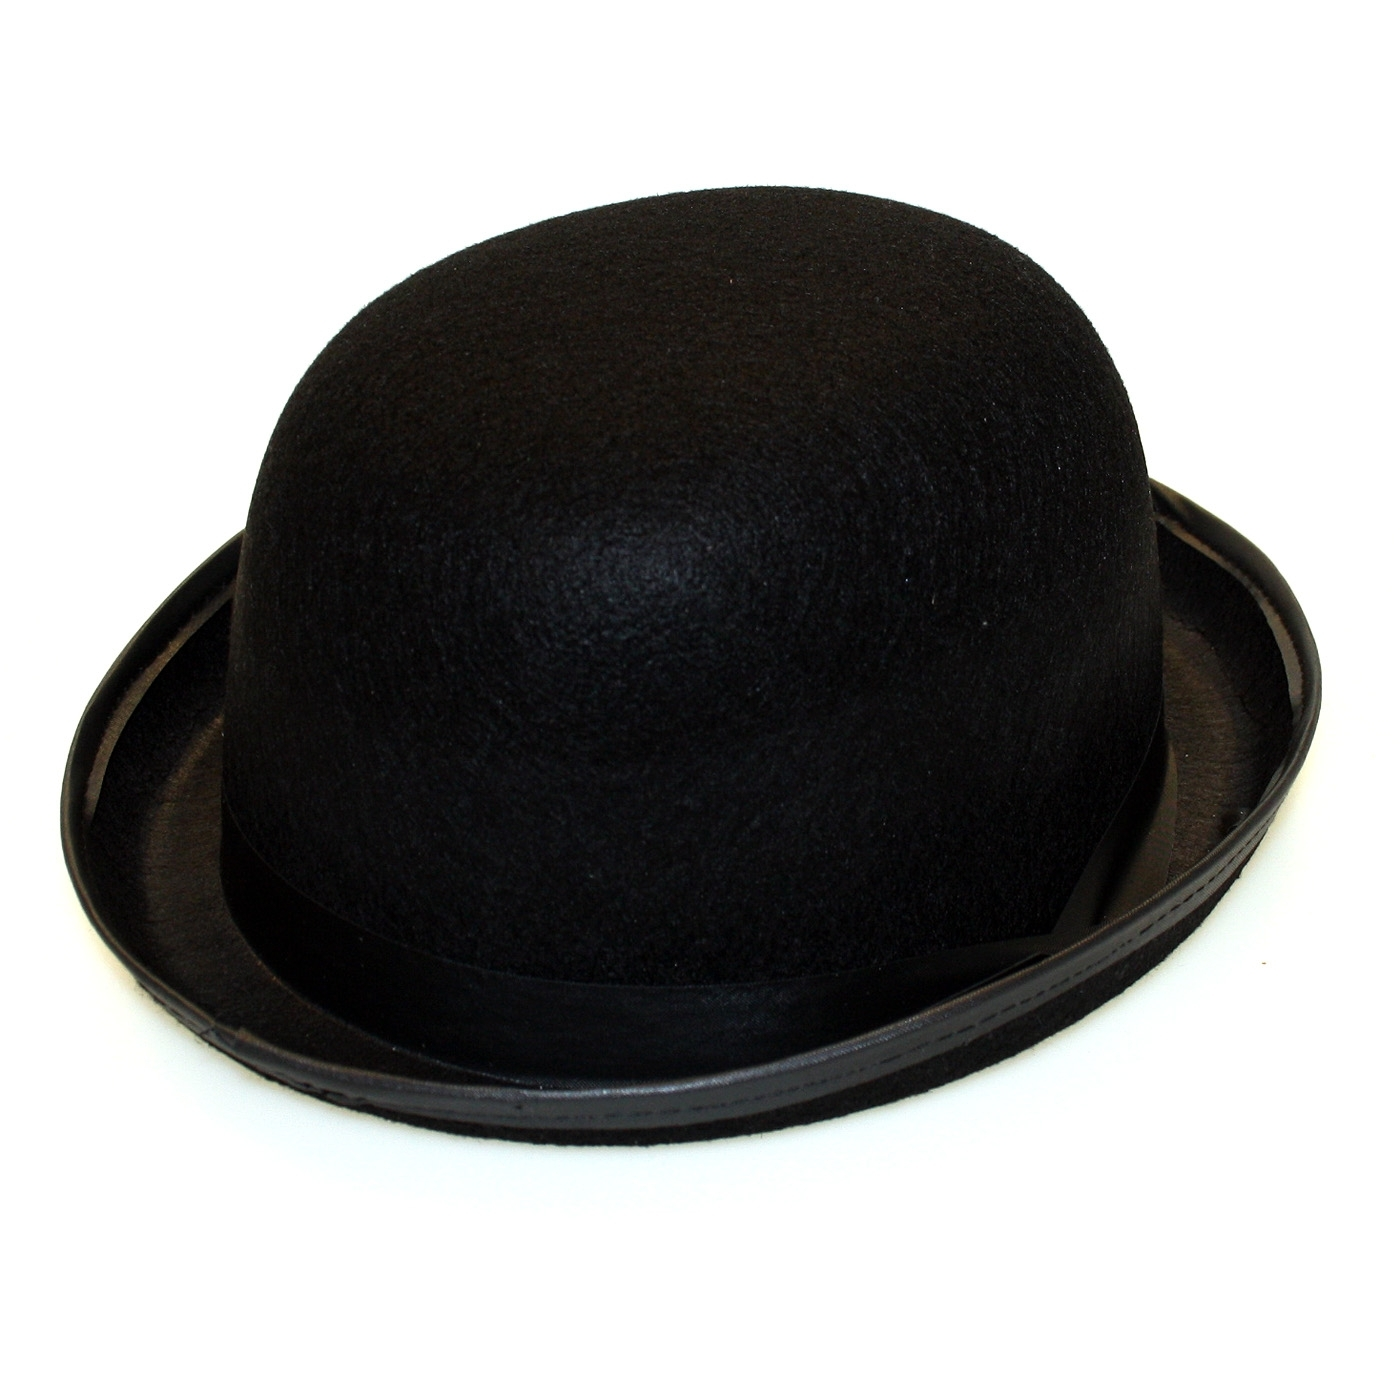 Peacock Hat Bolhoedpopul Cap Rigeshop